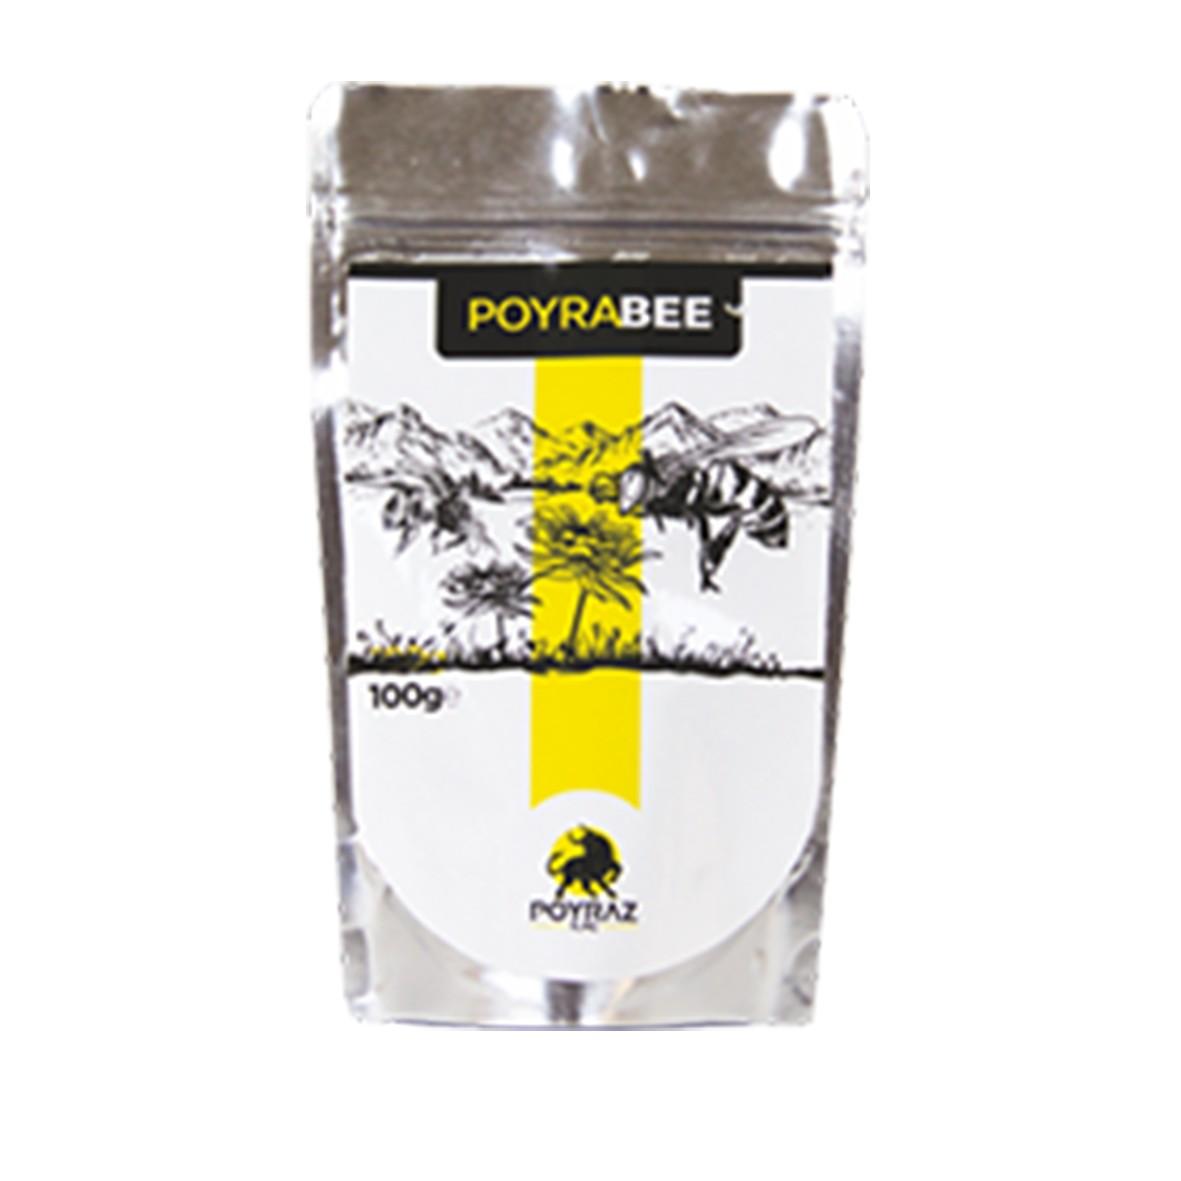 Poyrabee